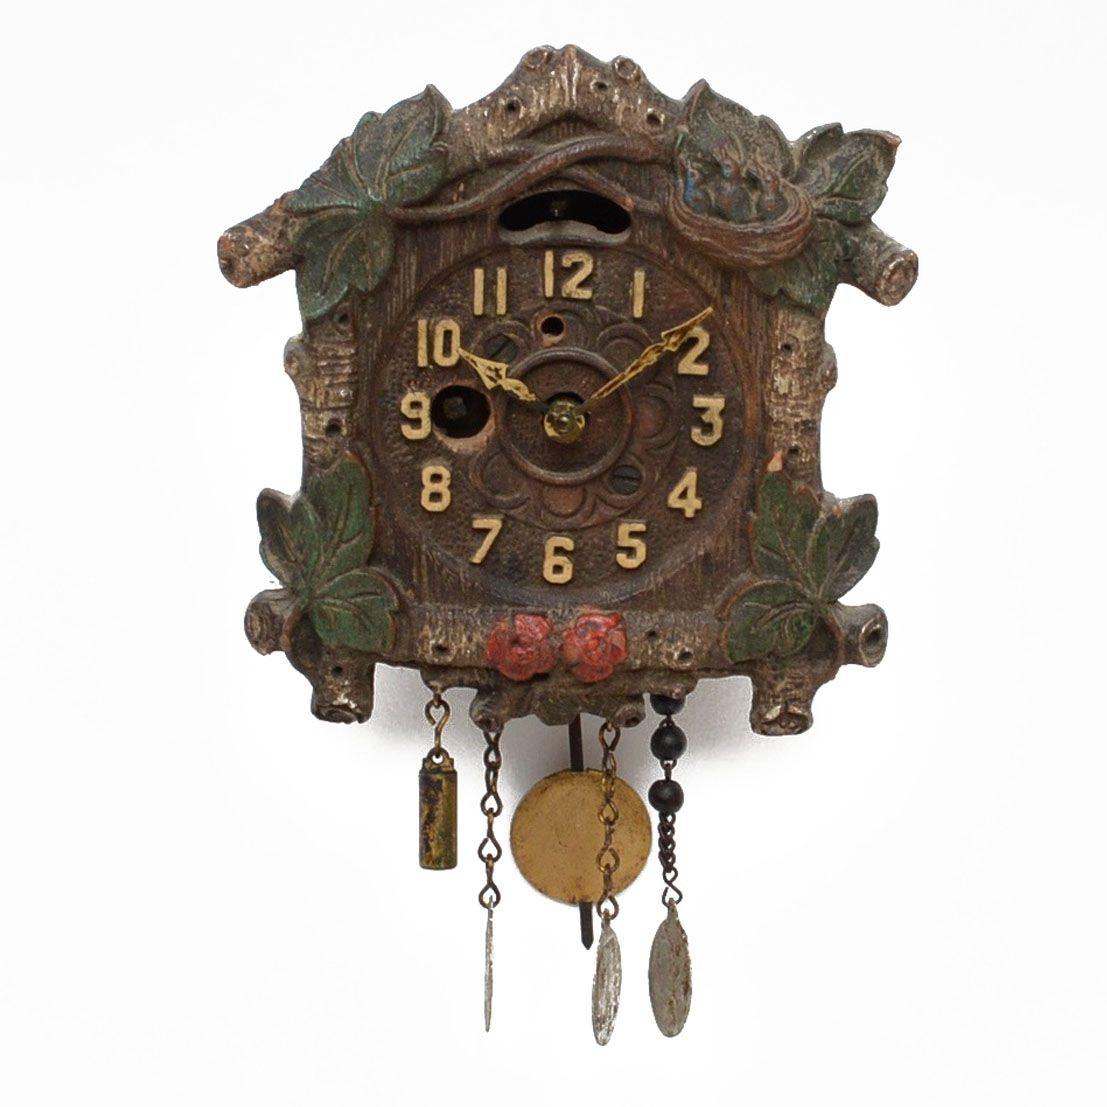 Miniature August Keebler Cuckoo Clock, circa 1920's